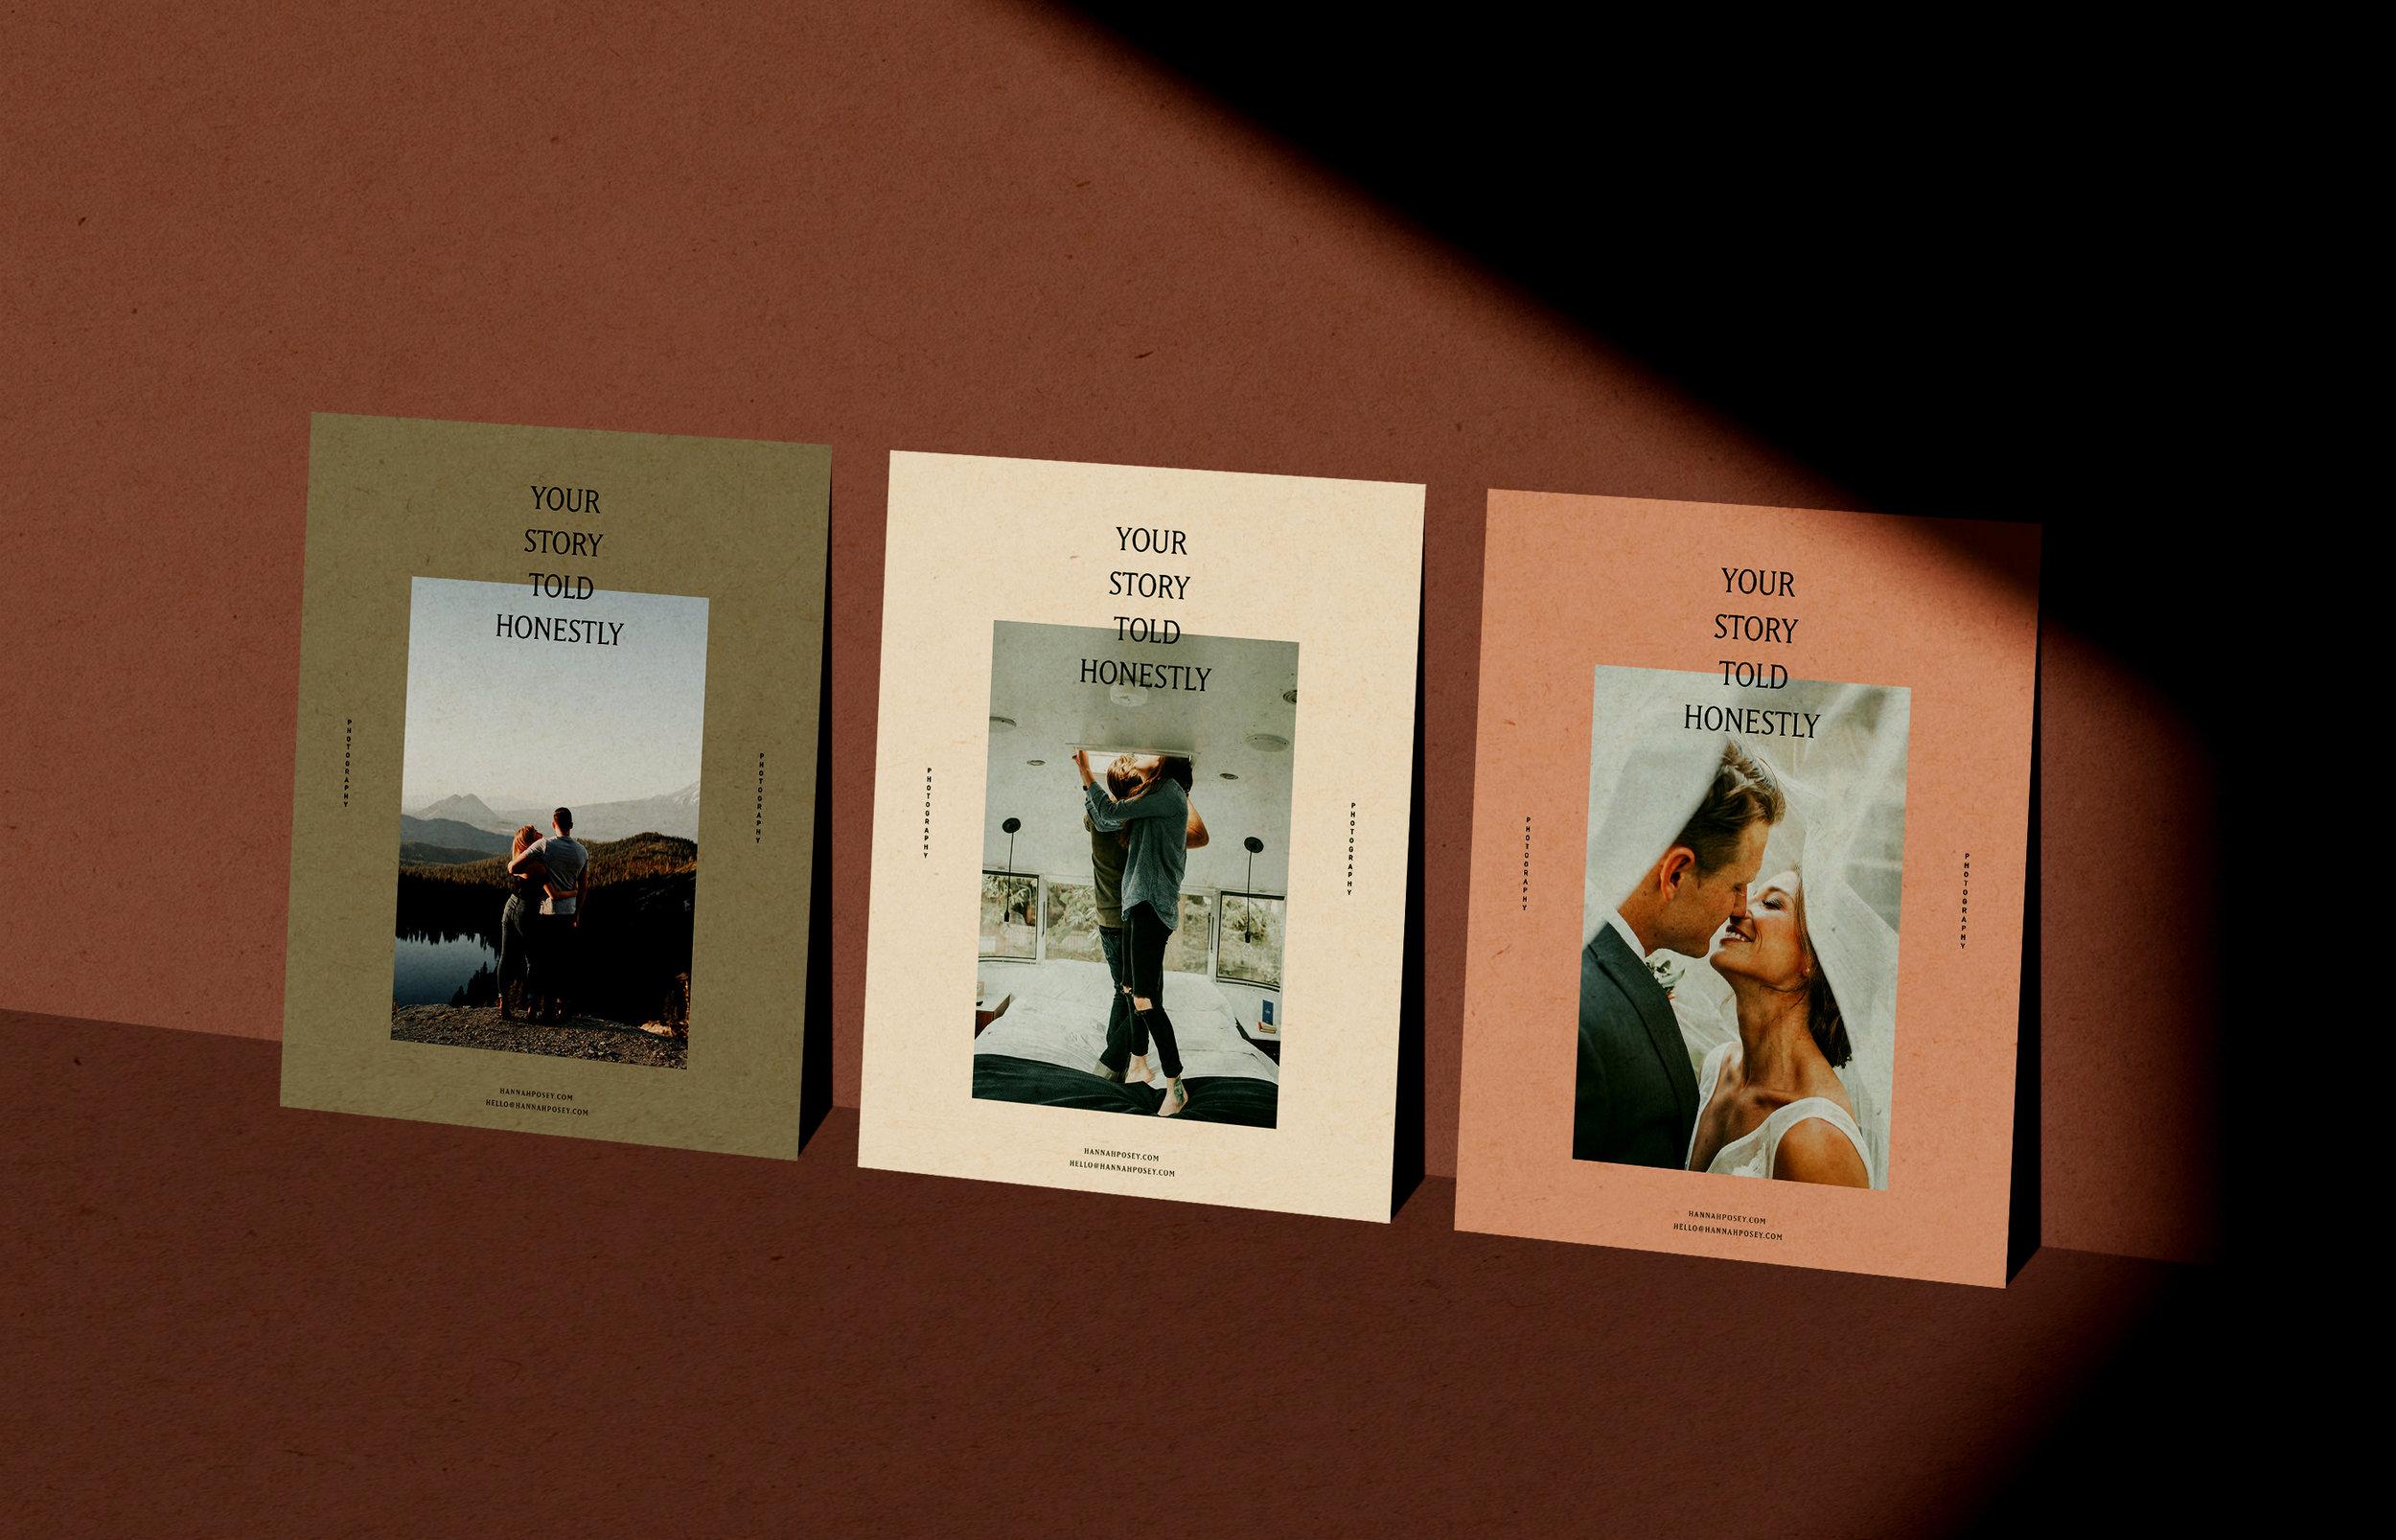 Cards_Angled_1.jpg